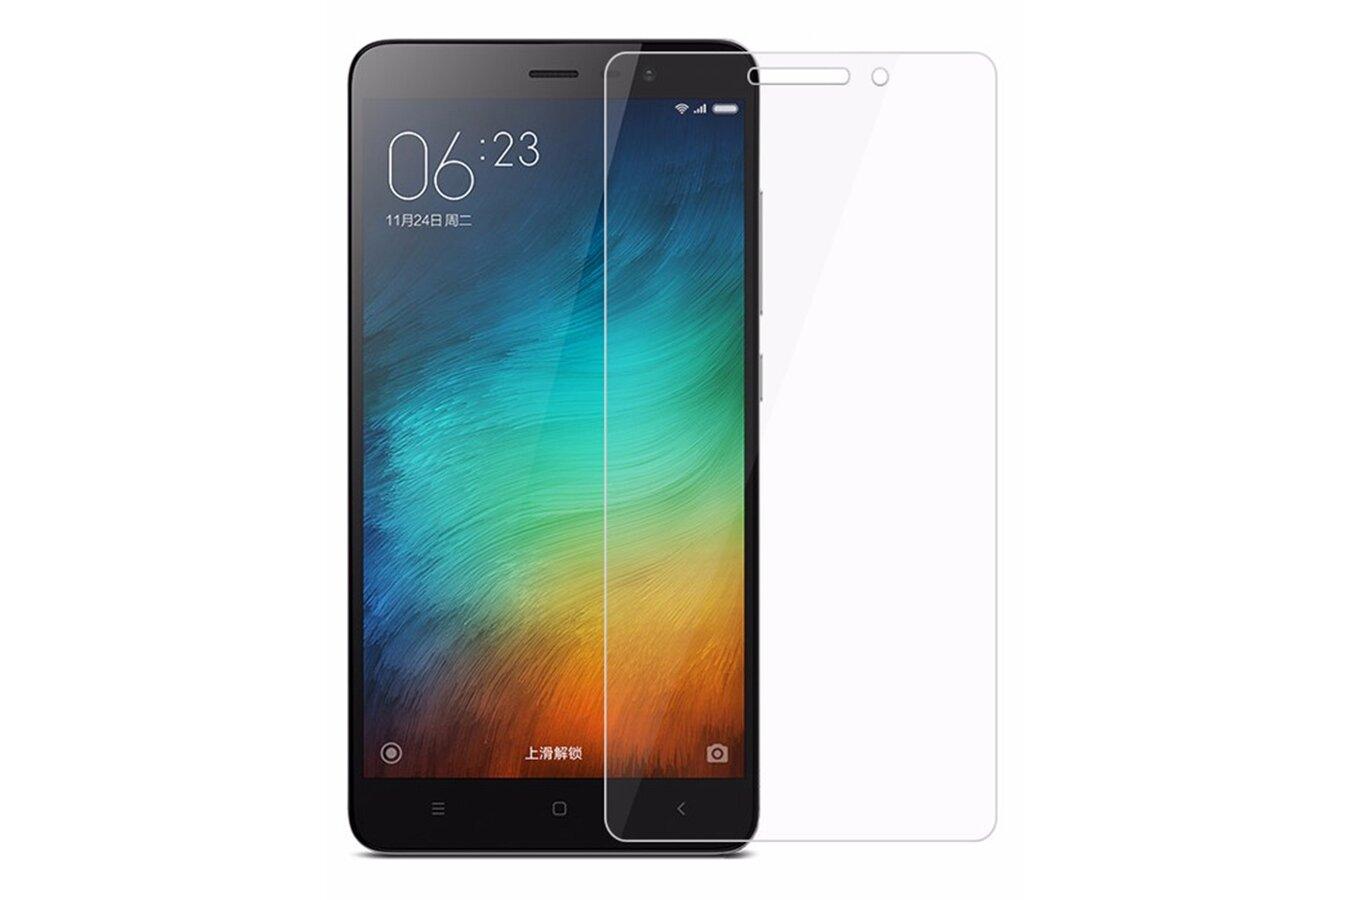 Защитное стекло Xiaomi Redmi Note 3 0.3мм 2.5D - фото pic_d17bd92ce9bfa635991fdbb61567db96_1920x9000_1.jpg